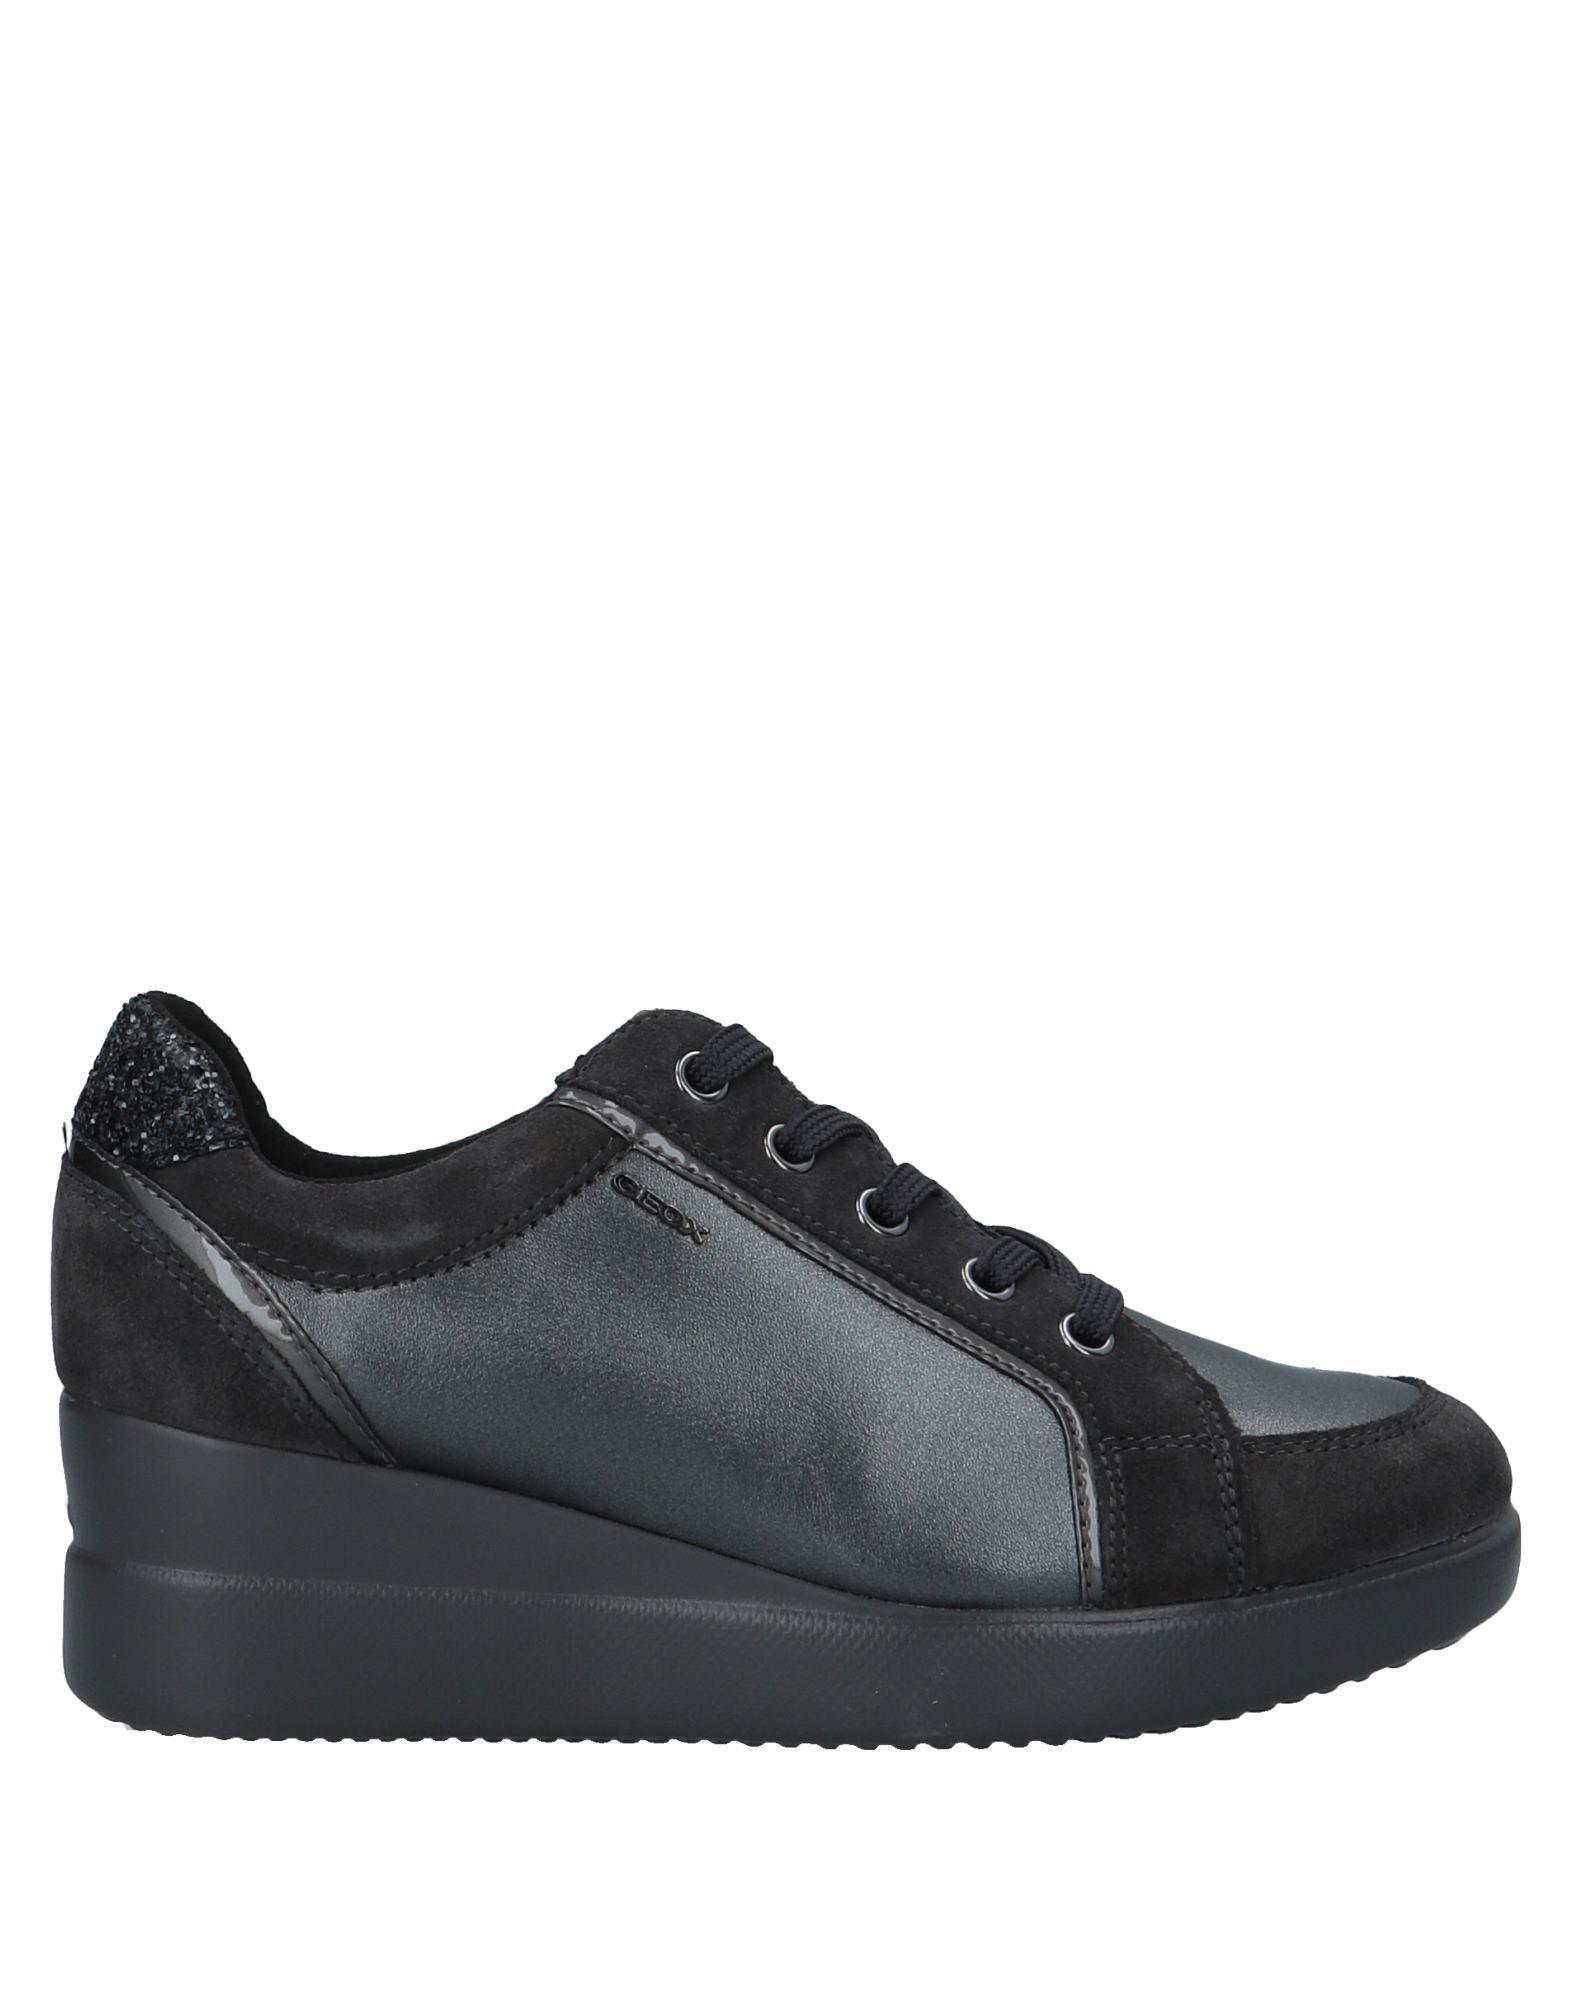 Geox Sneakers Damen  11542320MC 11542320MC 11542320MC Gute Qualität beliebte Schuhe 68aee3